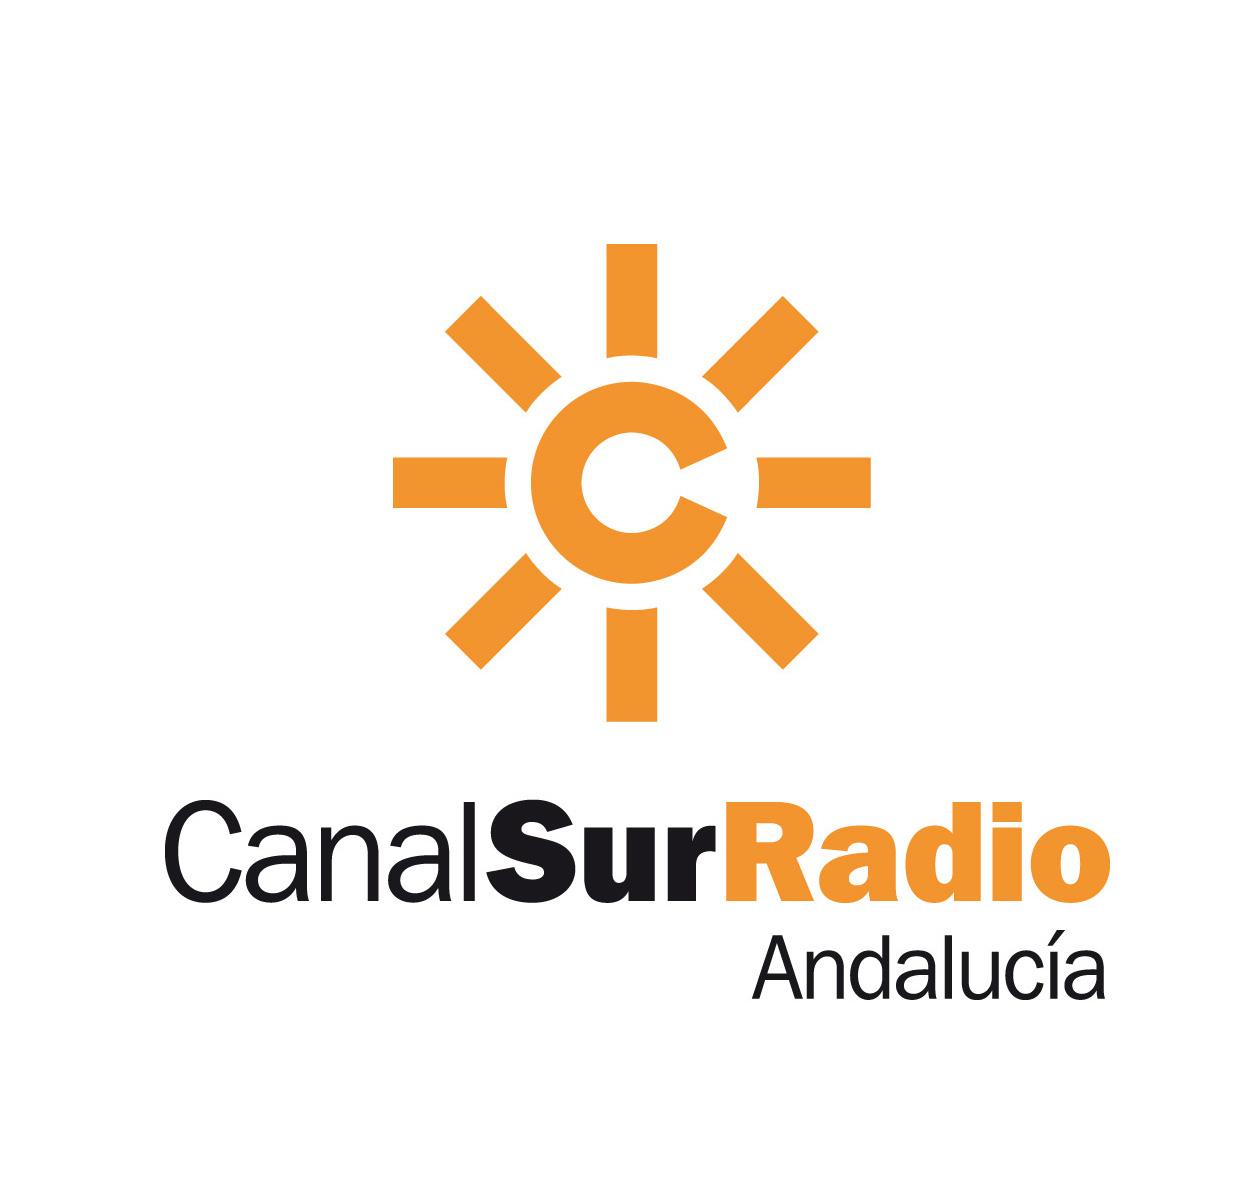 logo-canal-sur-radio